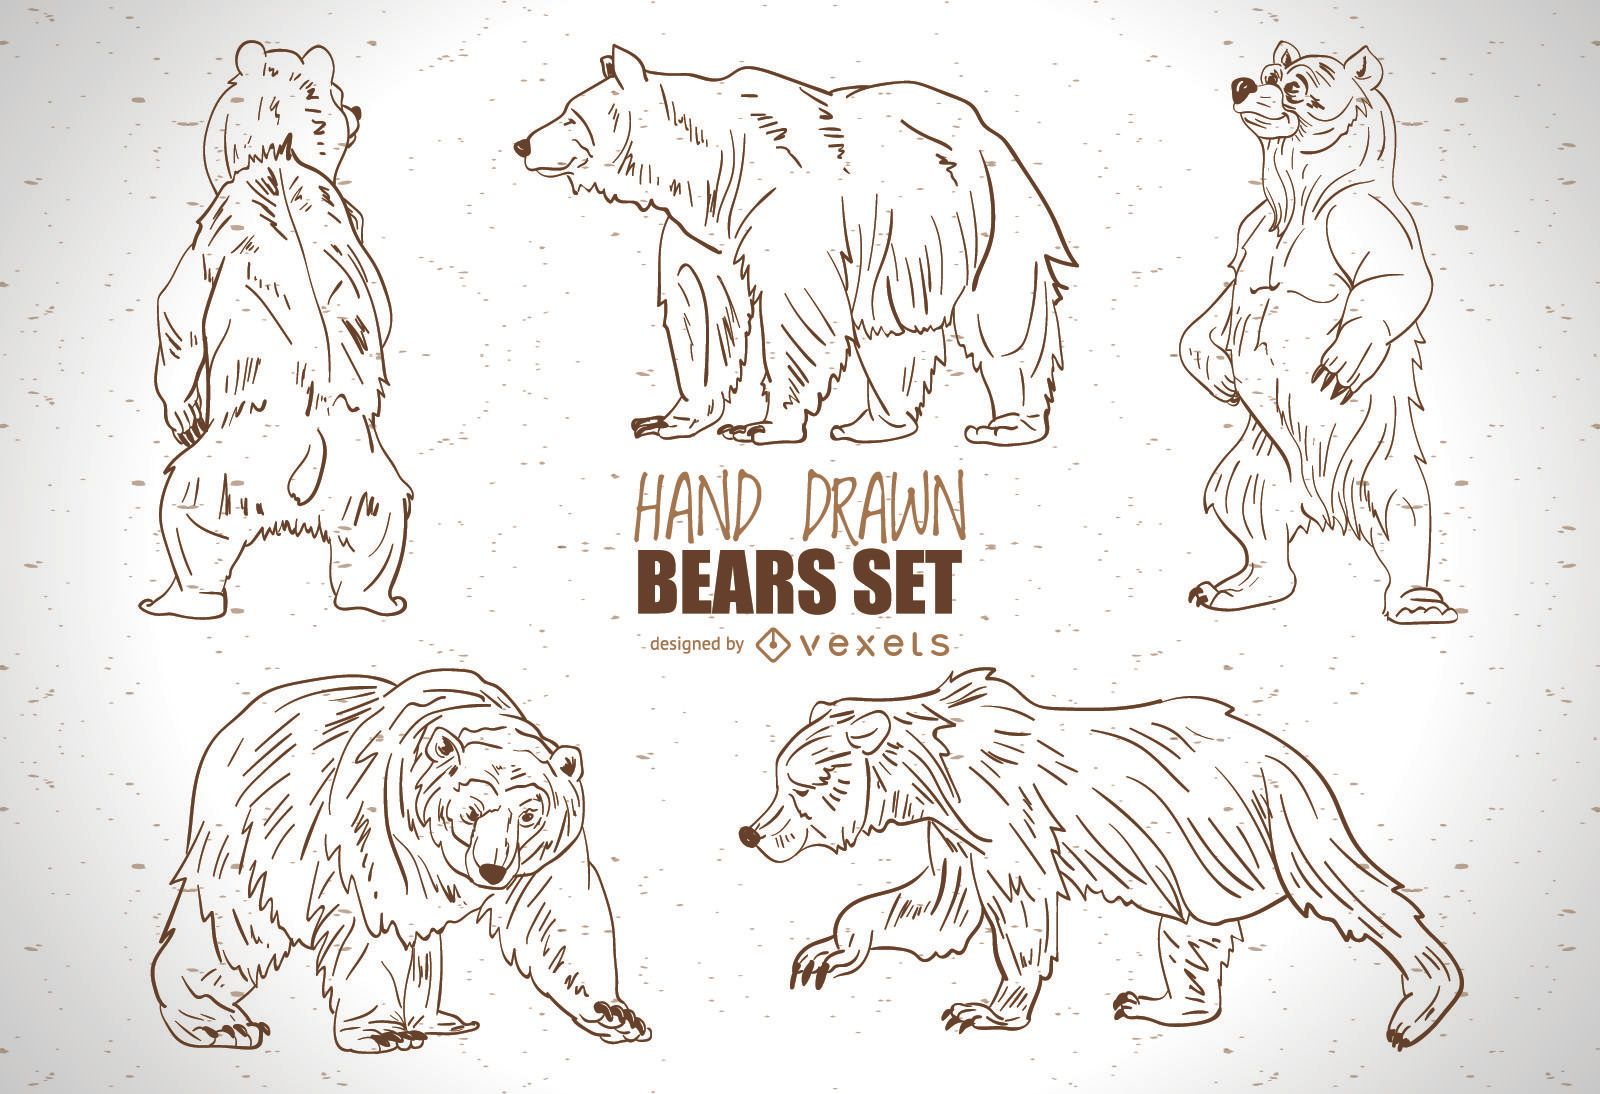 Hand drawn bears set